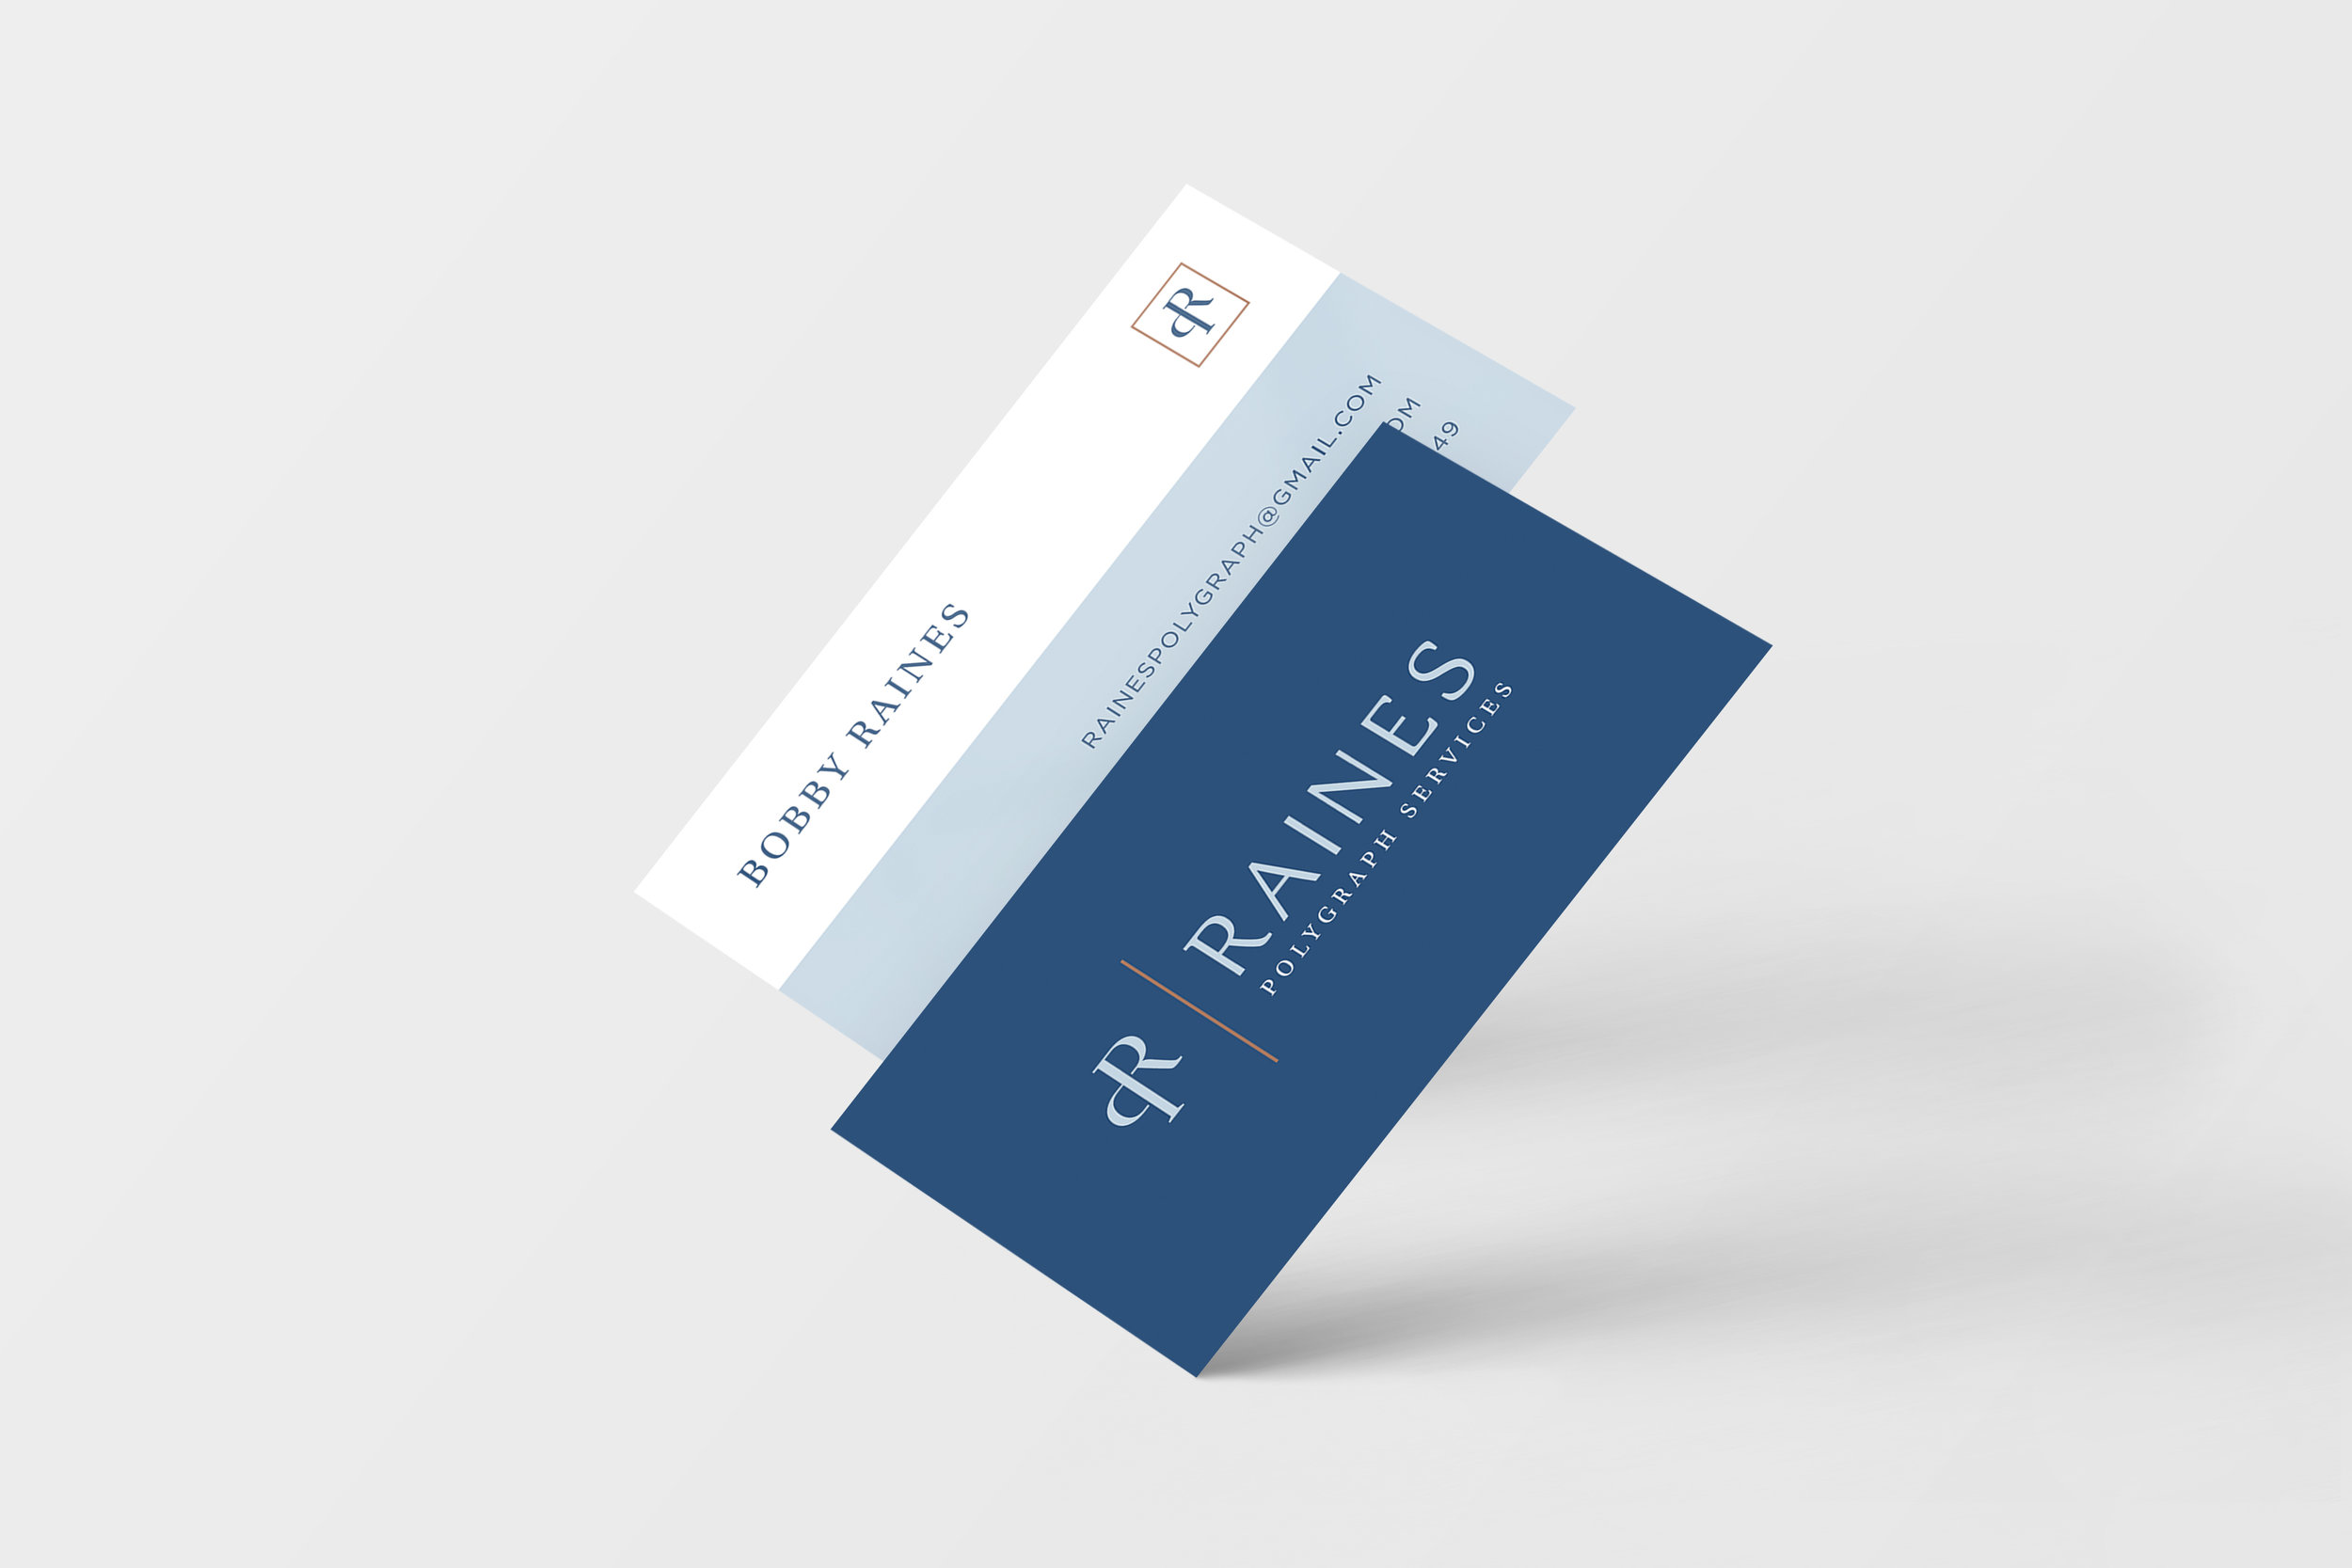 Raines Polygraph Services - Business Card Design - Tulsa brand designer - graphic designer - Hayley Bigham Designs